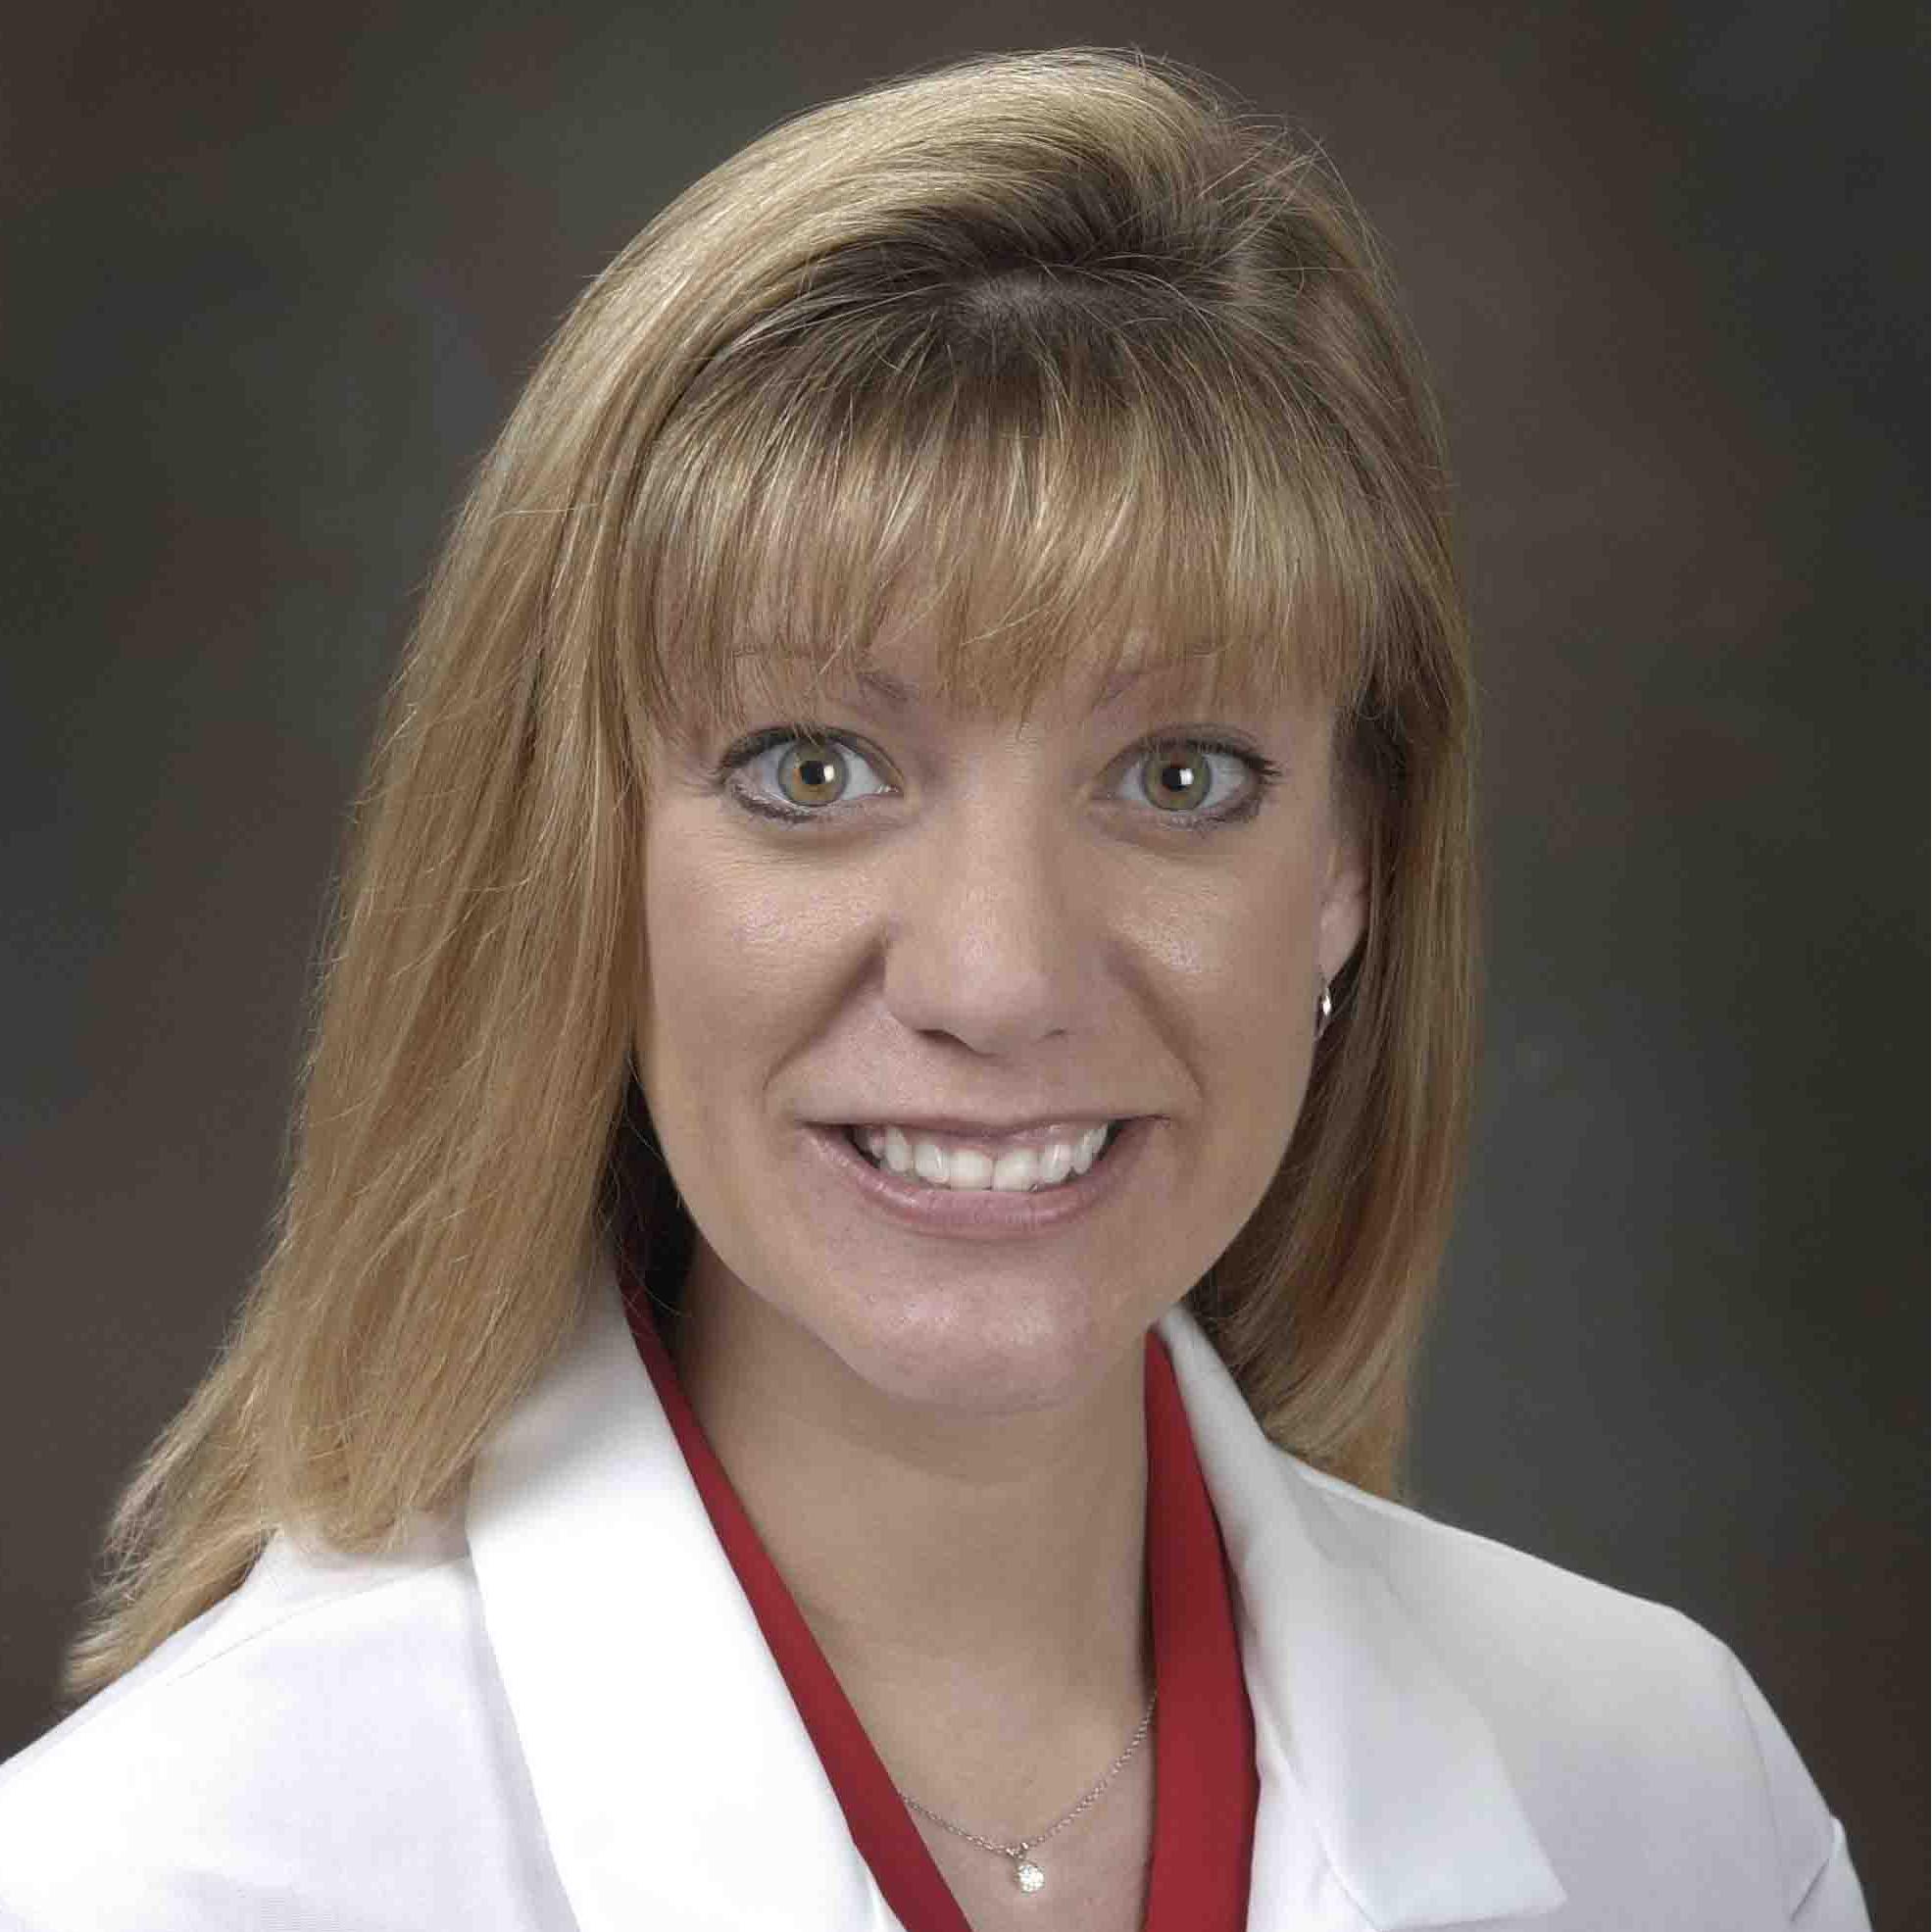 Dr  Pamela McQuillin, MD - OB/GYN - Odessa, TX Odessa, TX Odessa, TX